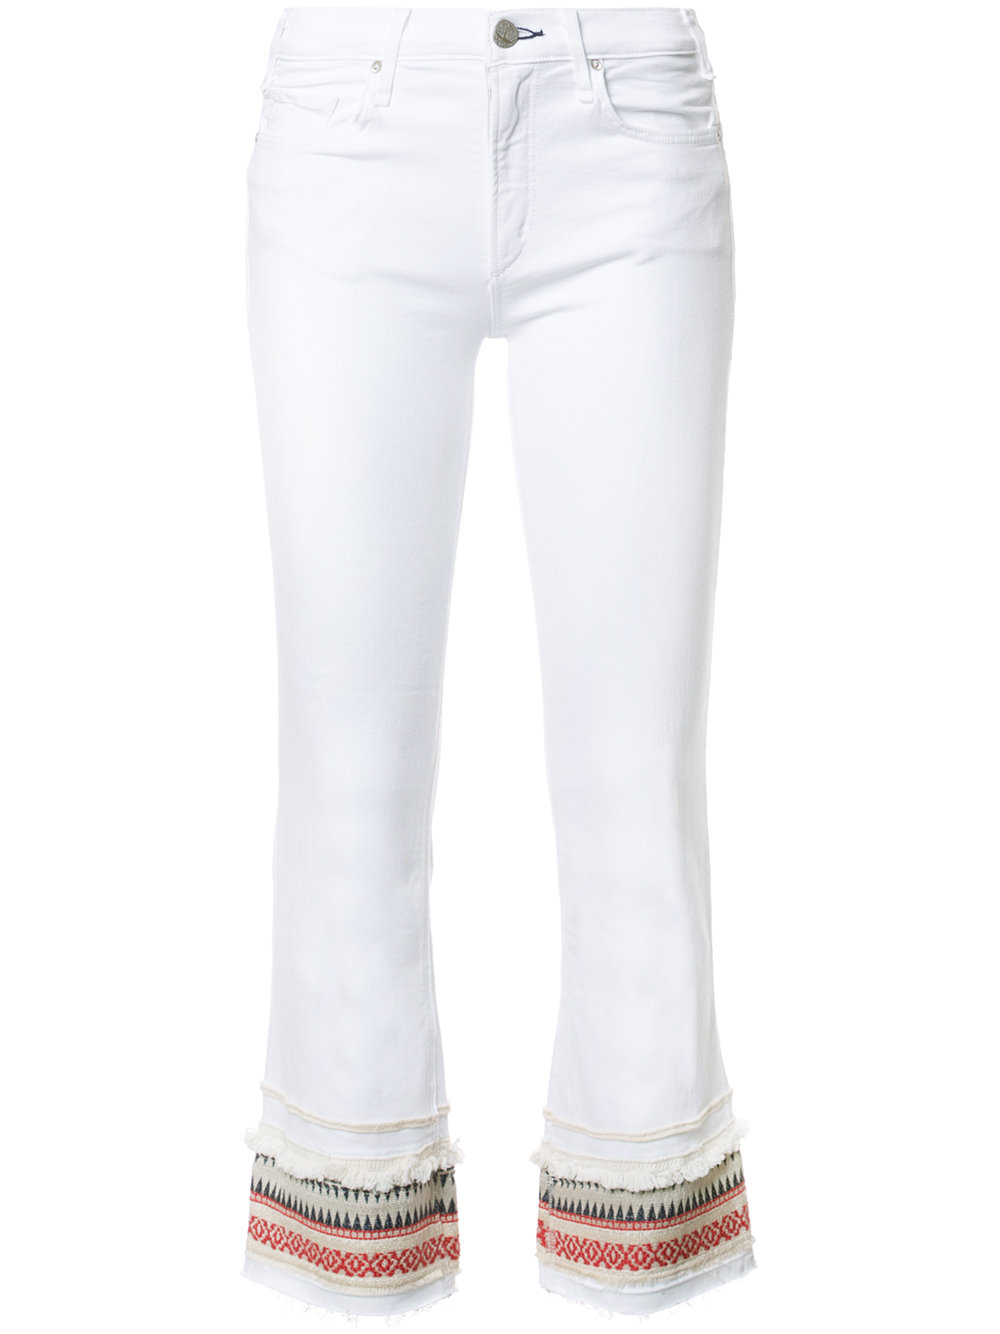 MCGUIRE DENIM jeans $260